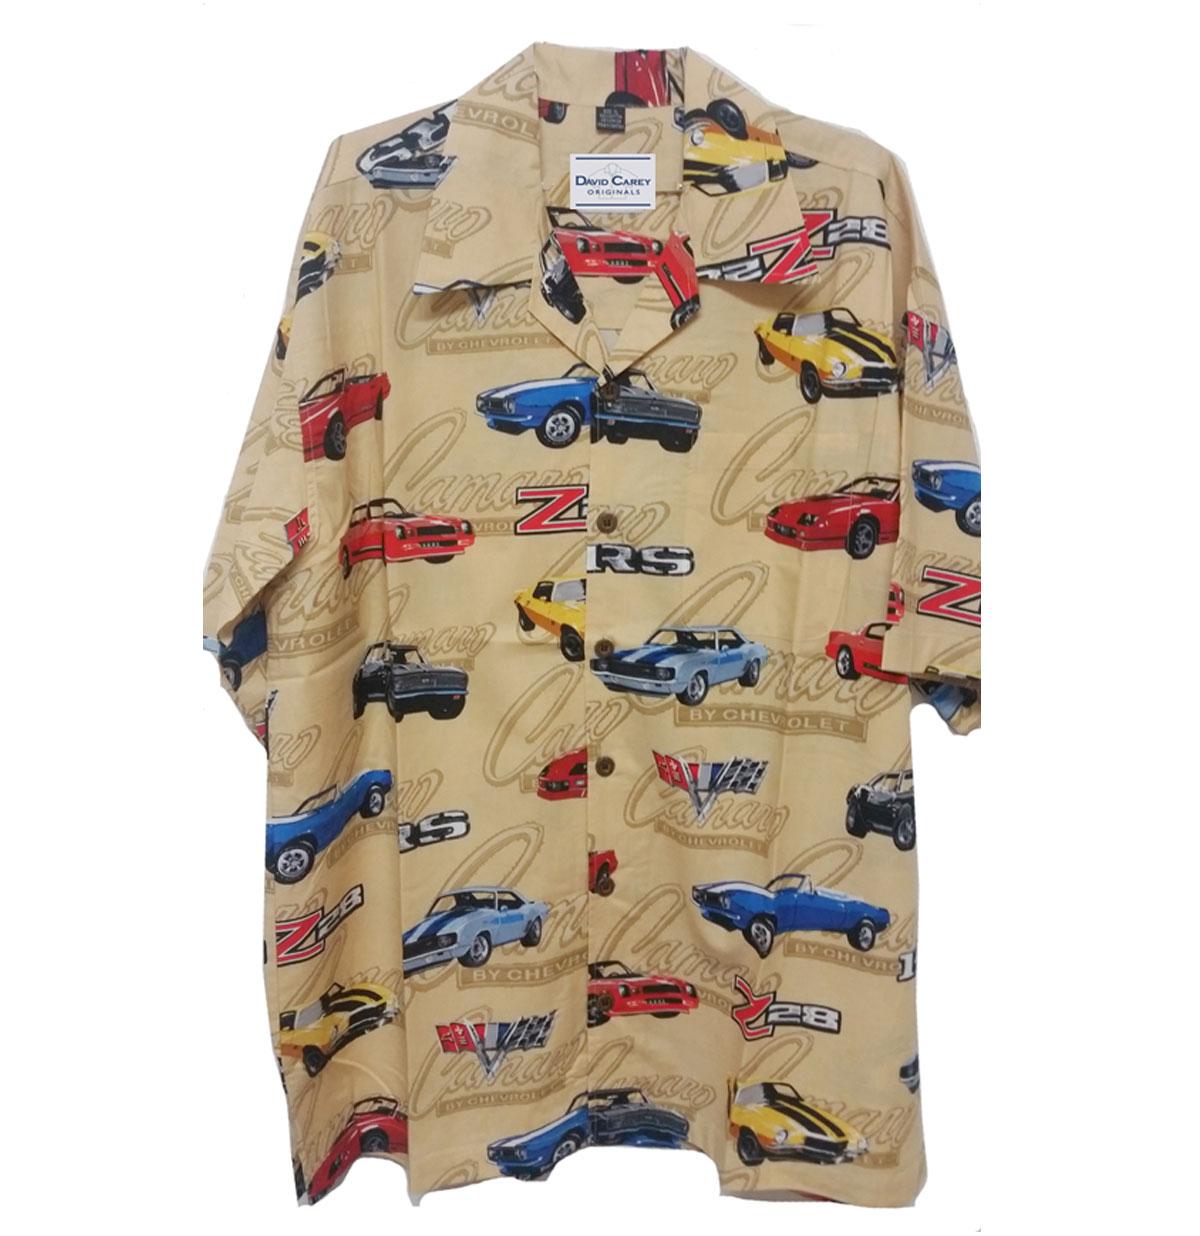 Cars Shirt Chevy Vintage Camaro Camp Creme